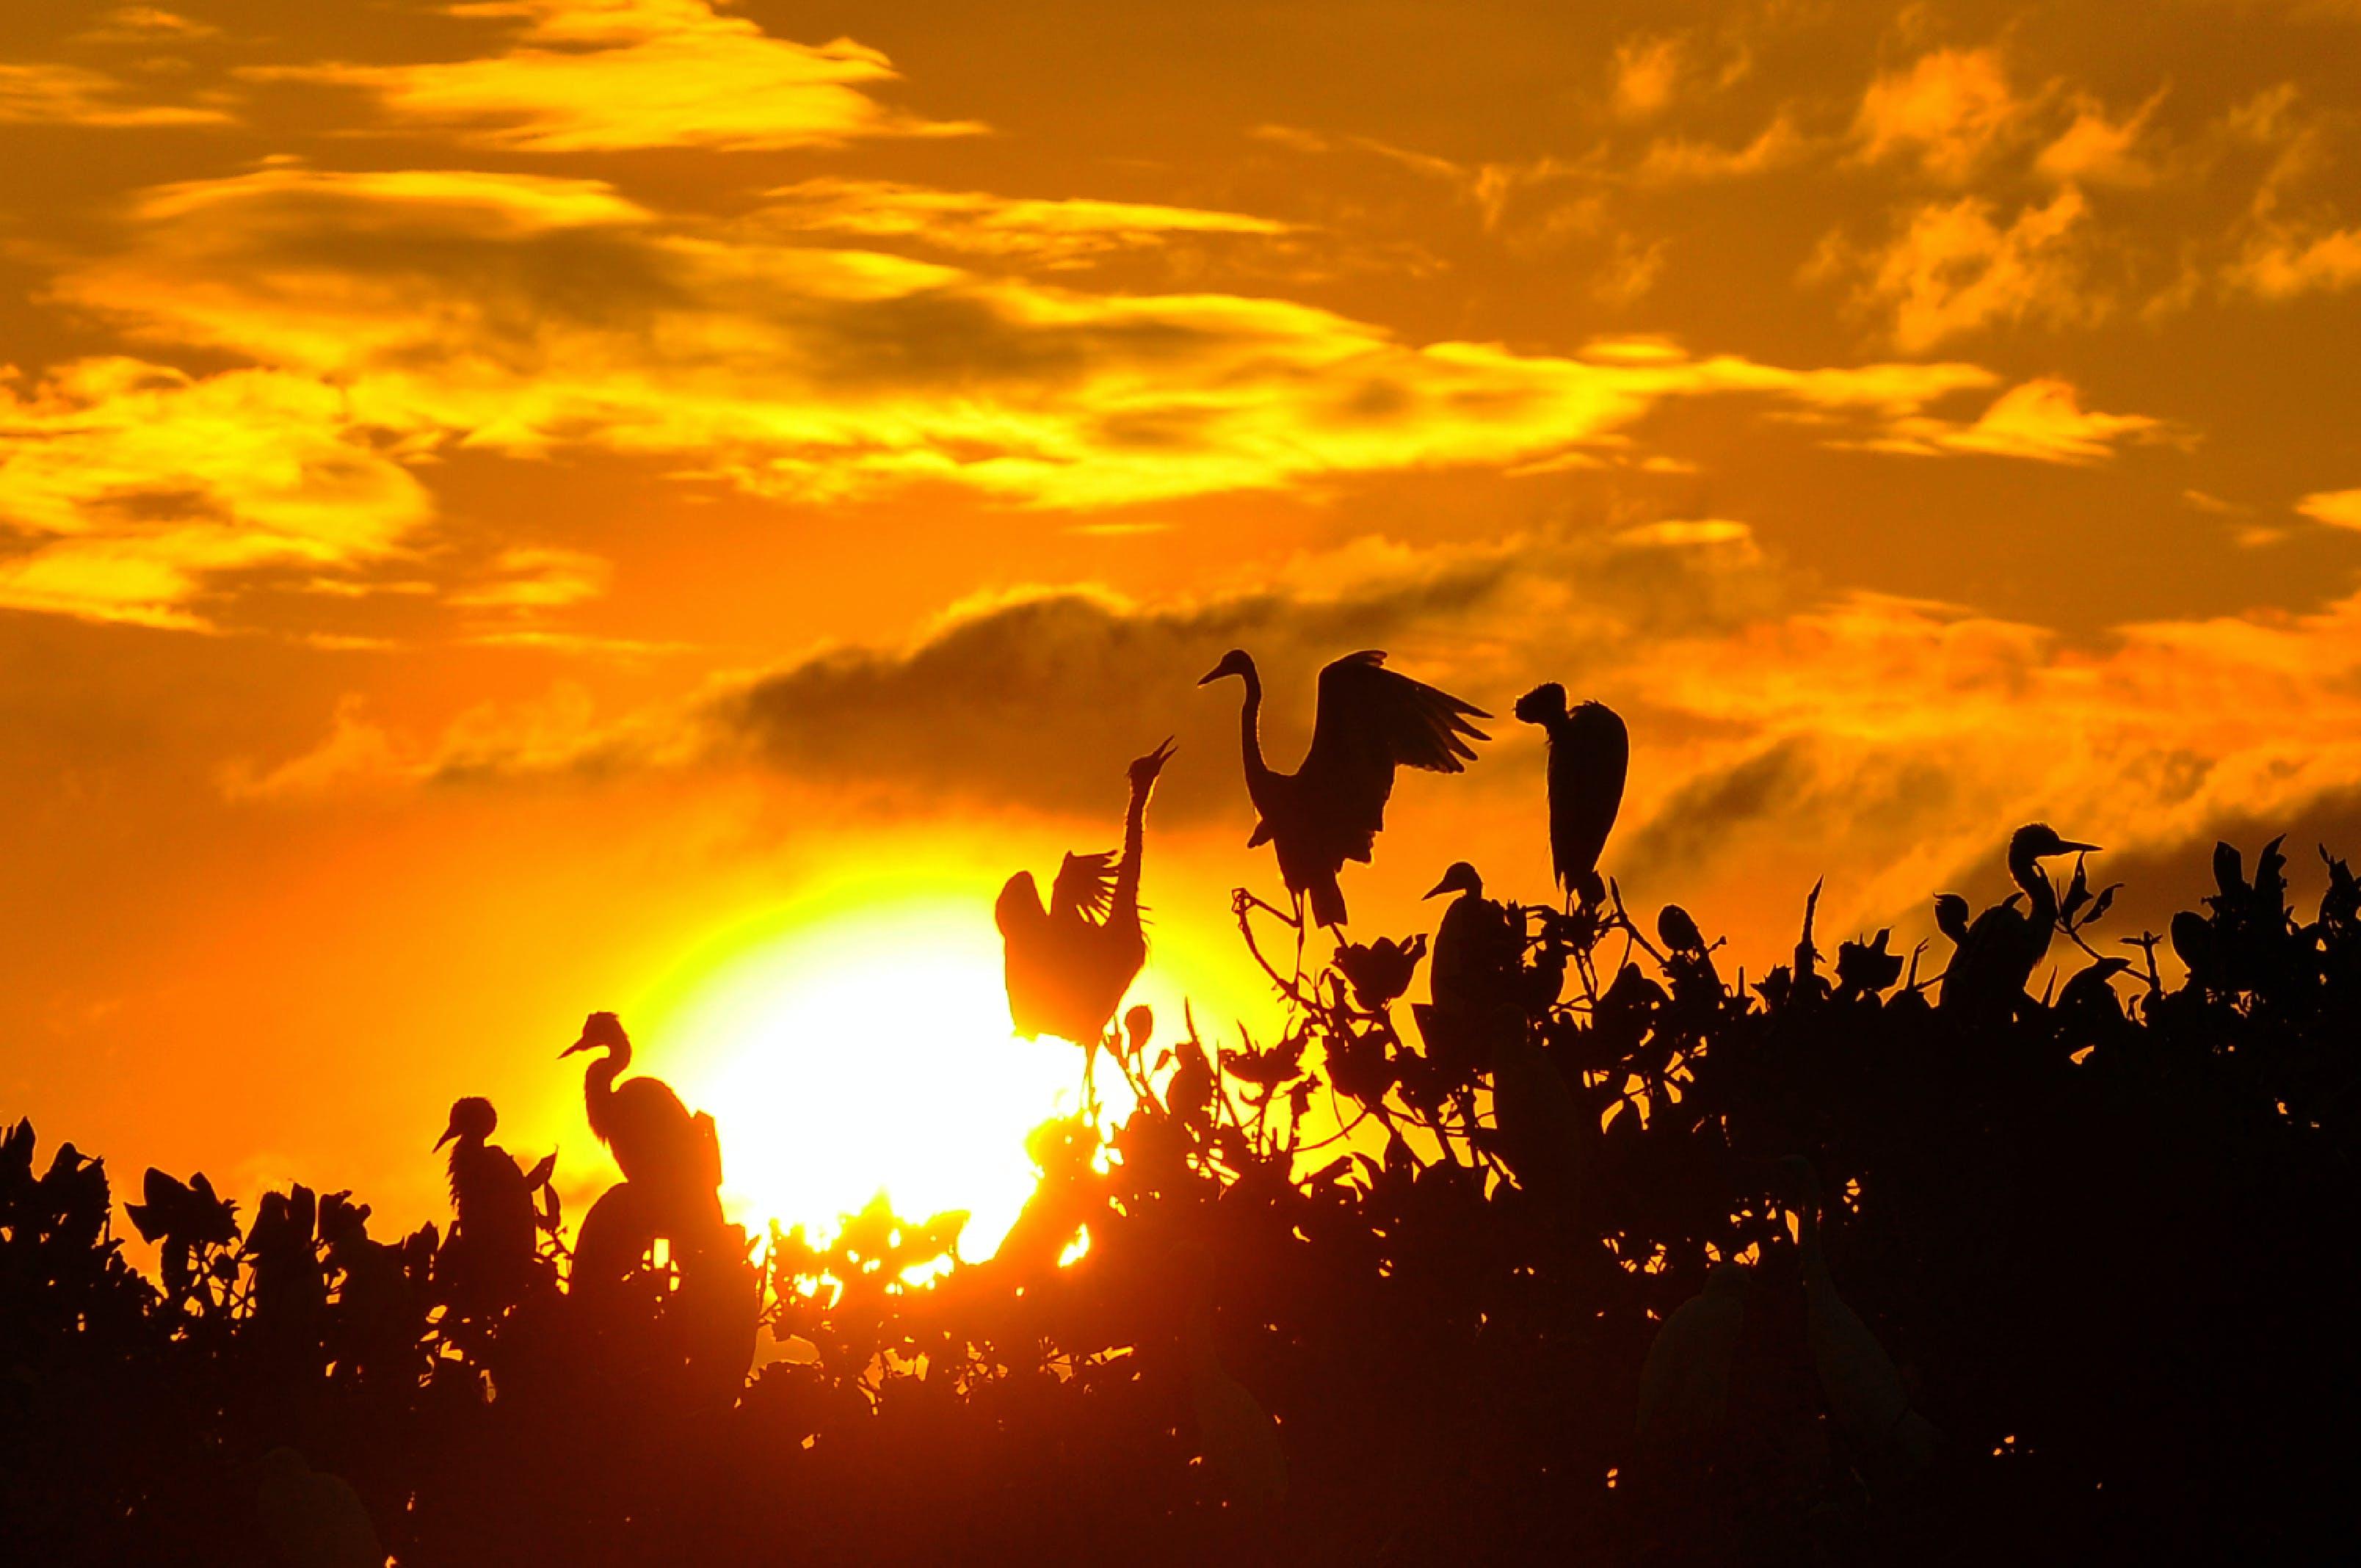 Free stock photo of #birds, #sunset, #wildlife